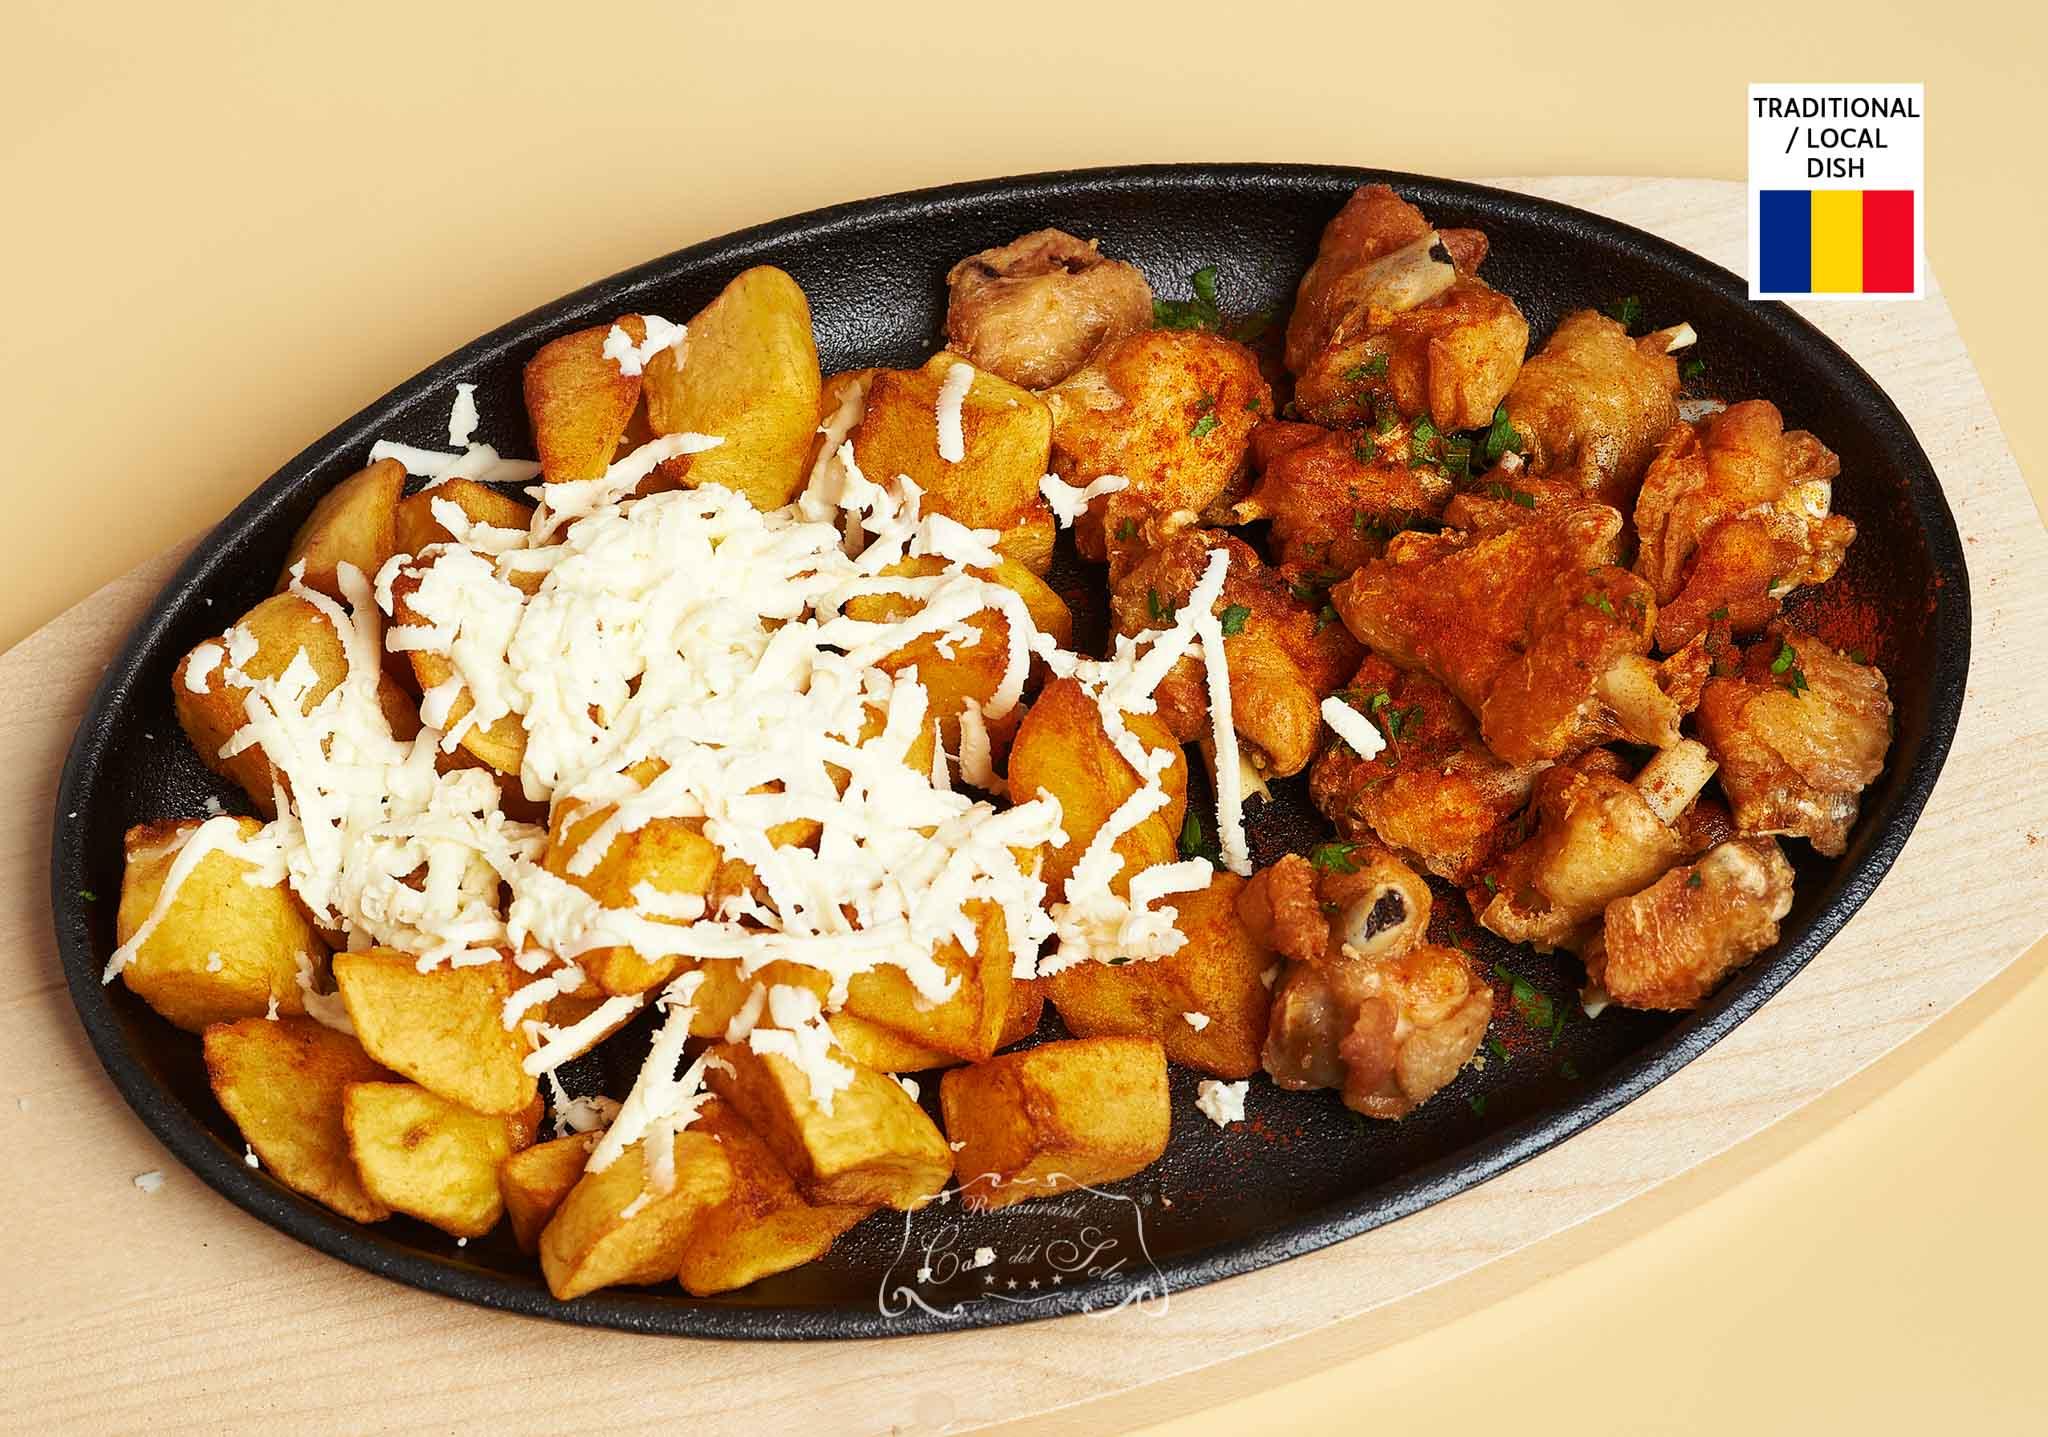 Livram la domiciliu Jumeri din aripi de pui cu cartofi fripti si branza in Timisoara